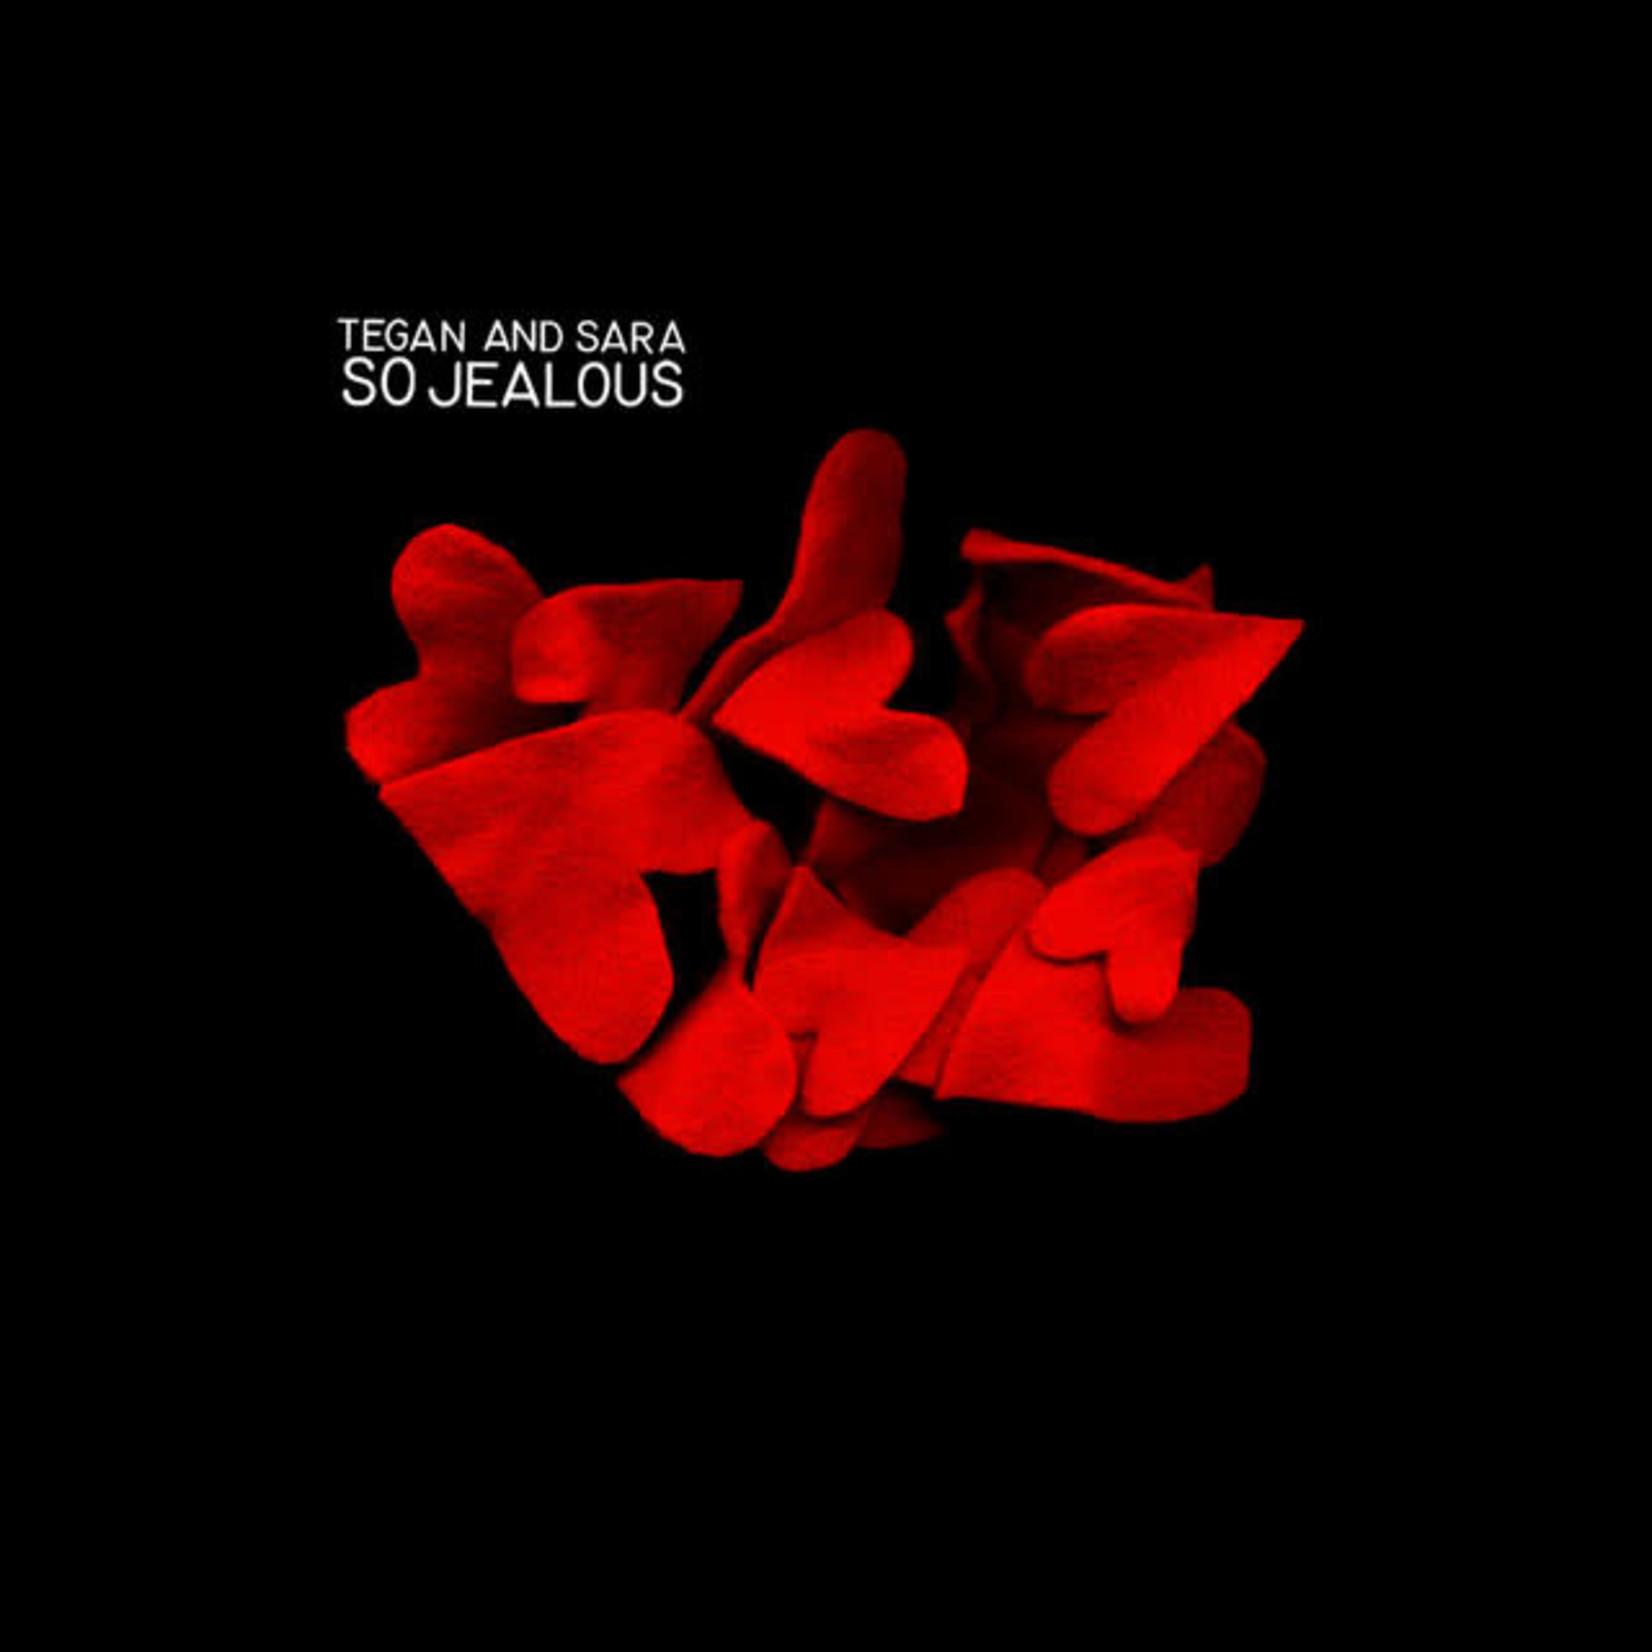 Vinyl Tegan And Sarah - So Jealous